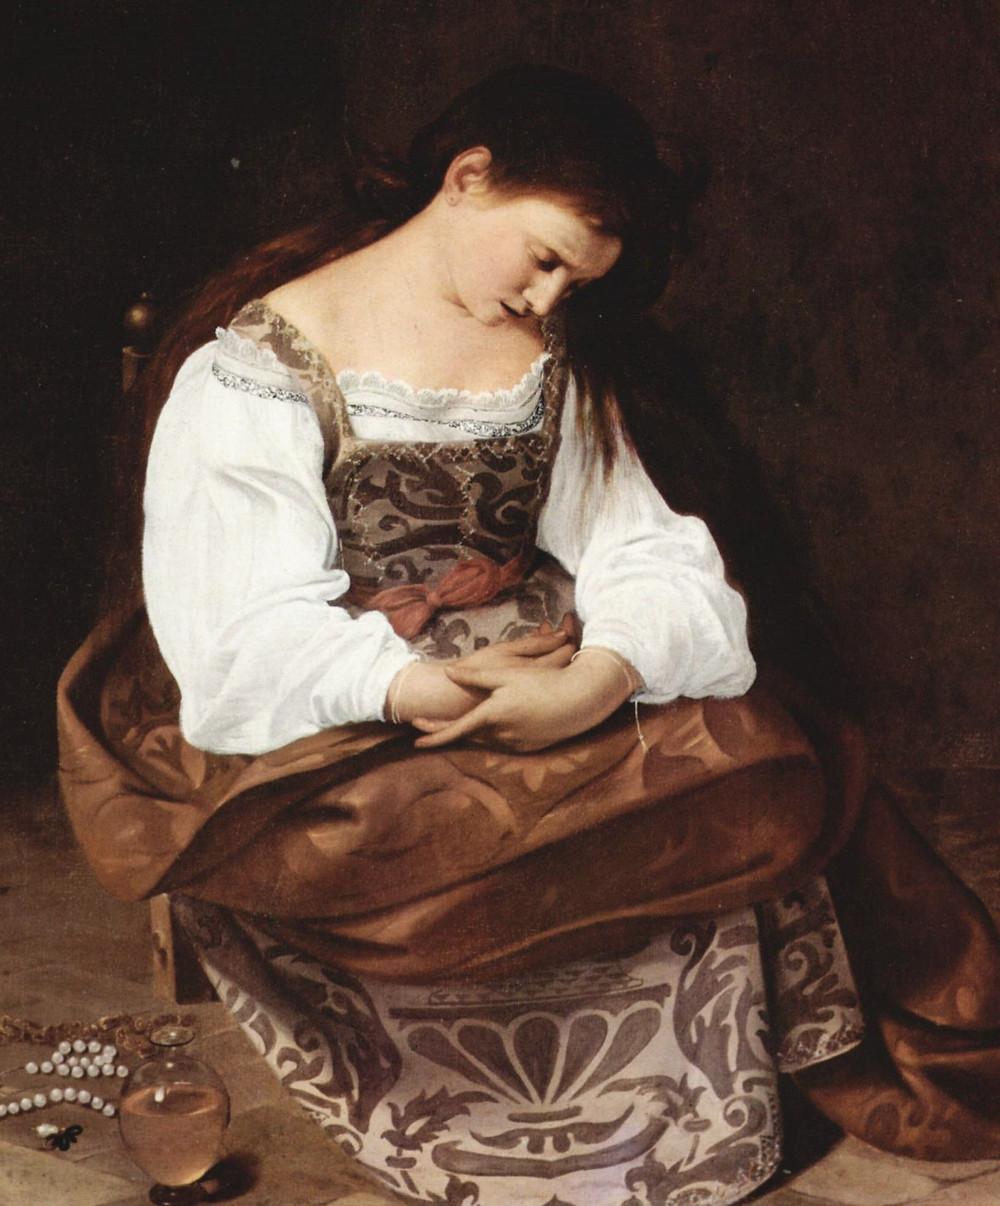 Caravaggio, Penitent Magdalene, 1595